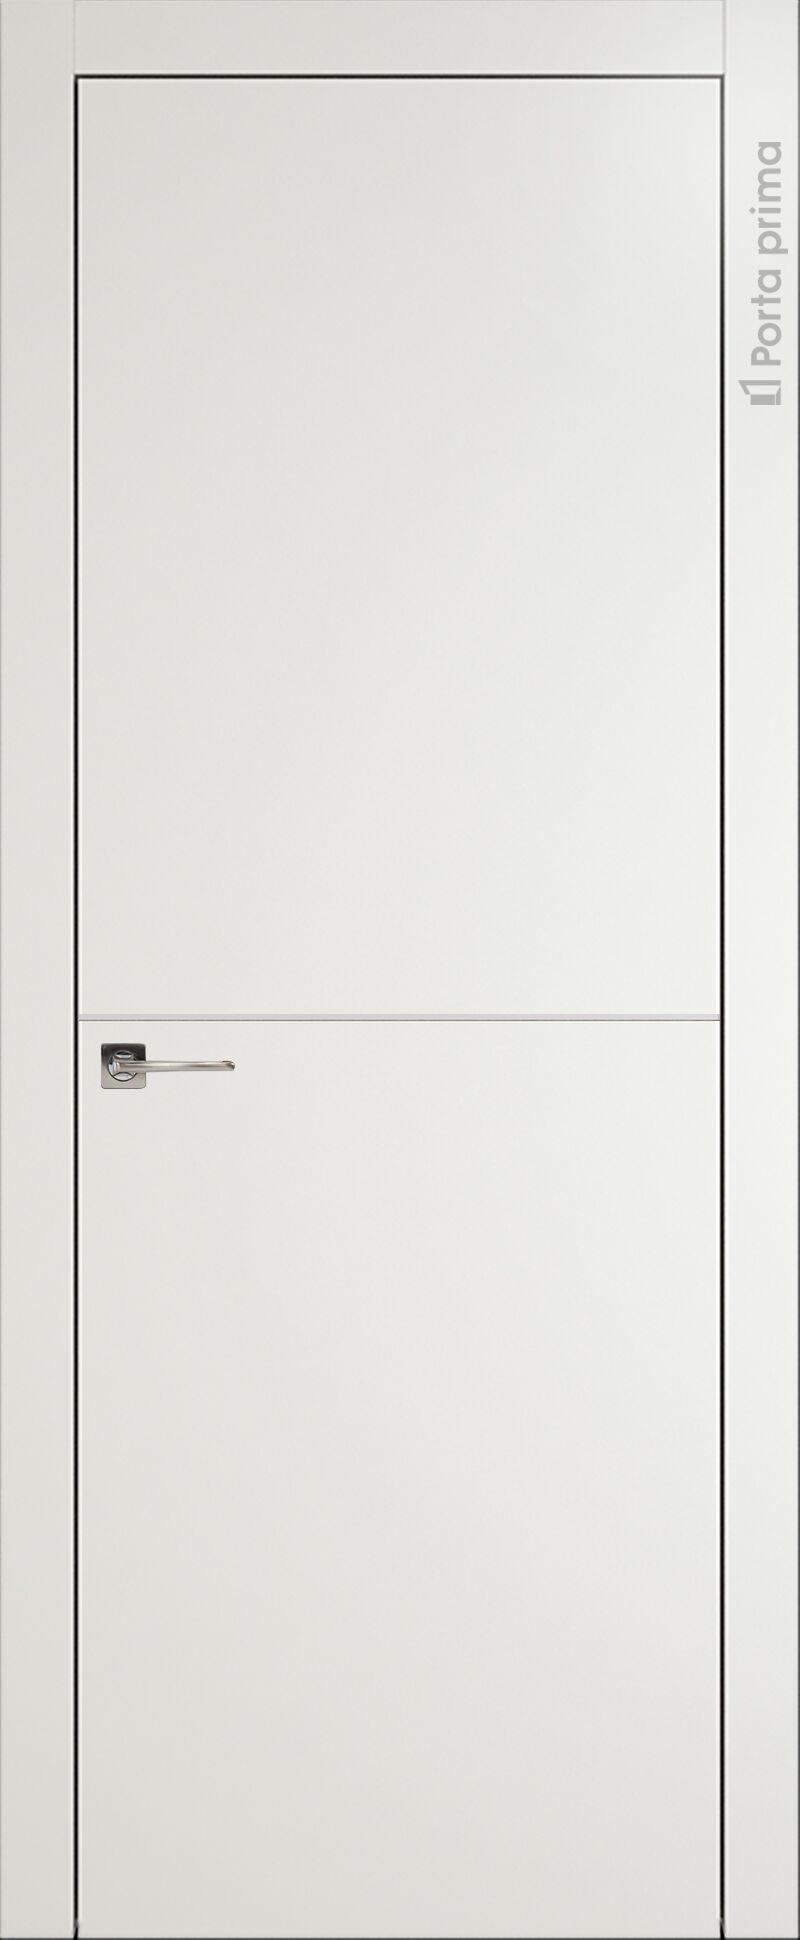 Tivoli Б-3 цвет - Бежевая эмаль (RAL 9010) Без стекла (ДГ)